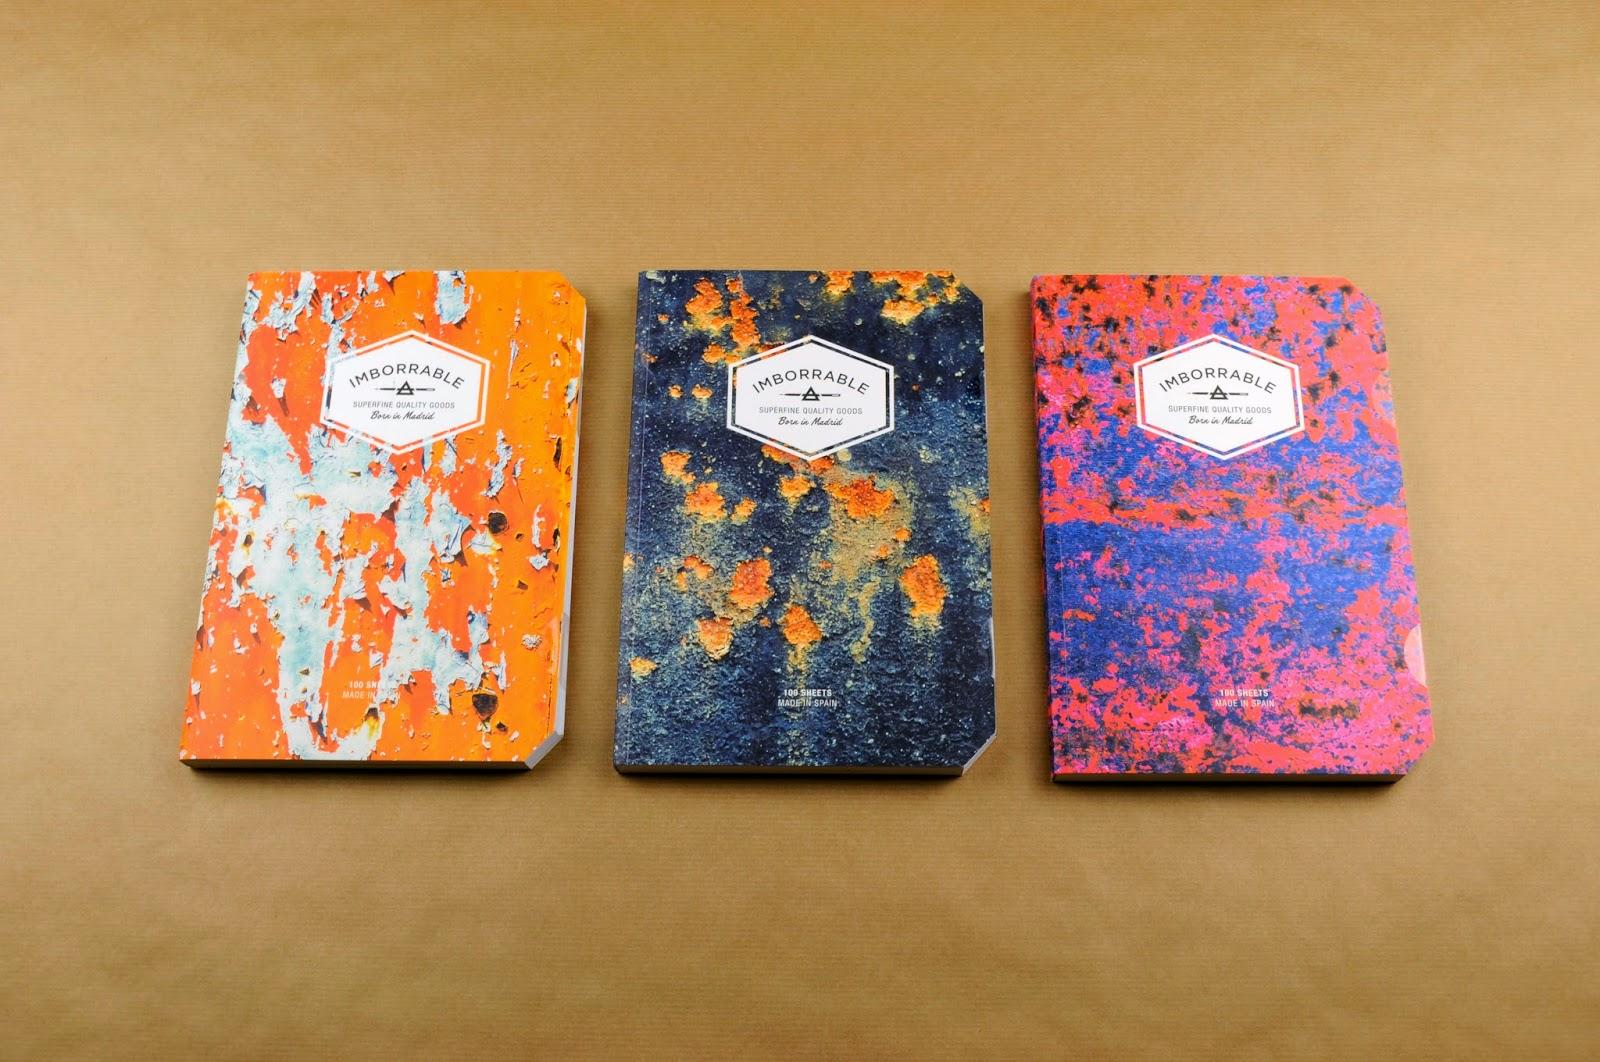 imborrable-cuaderno-4